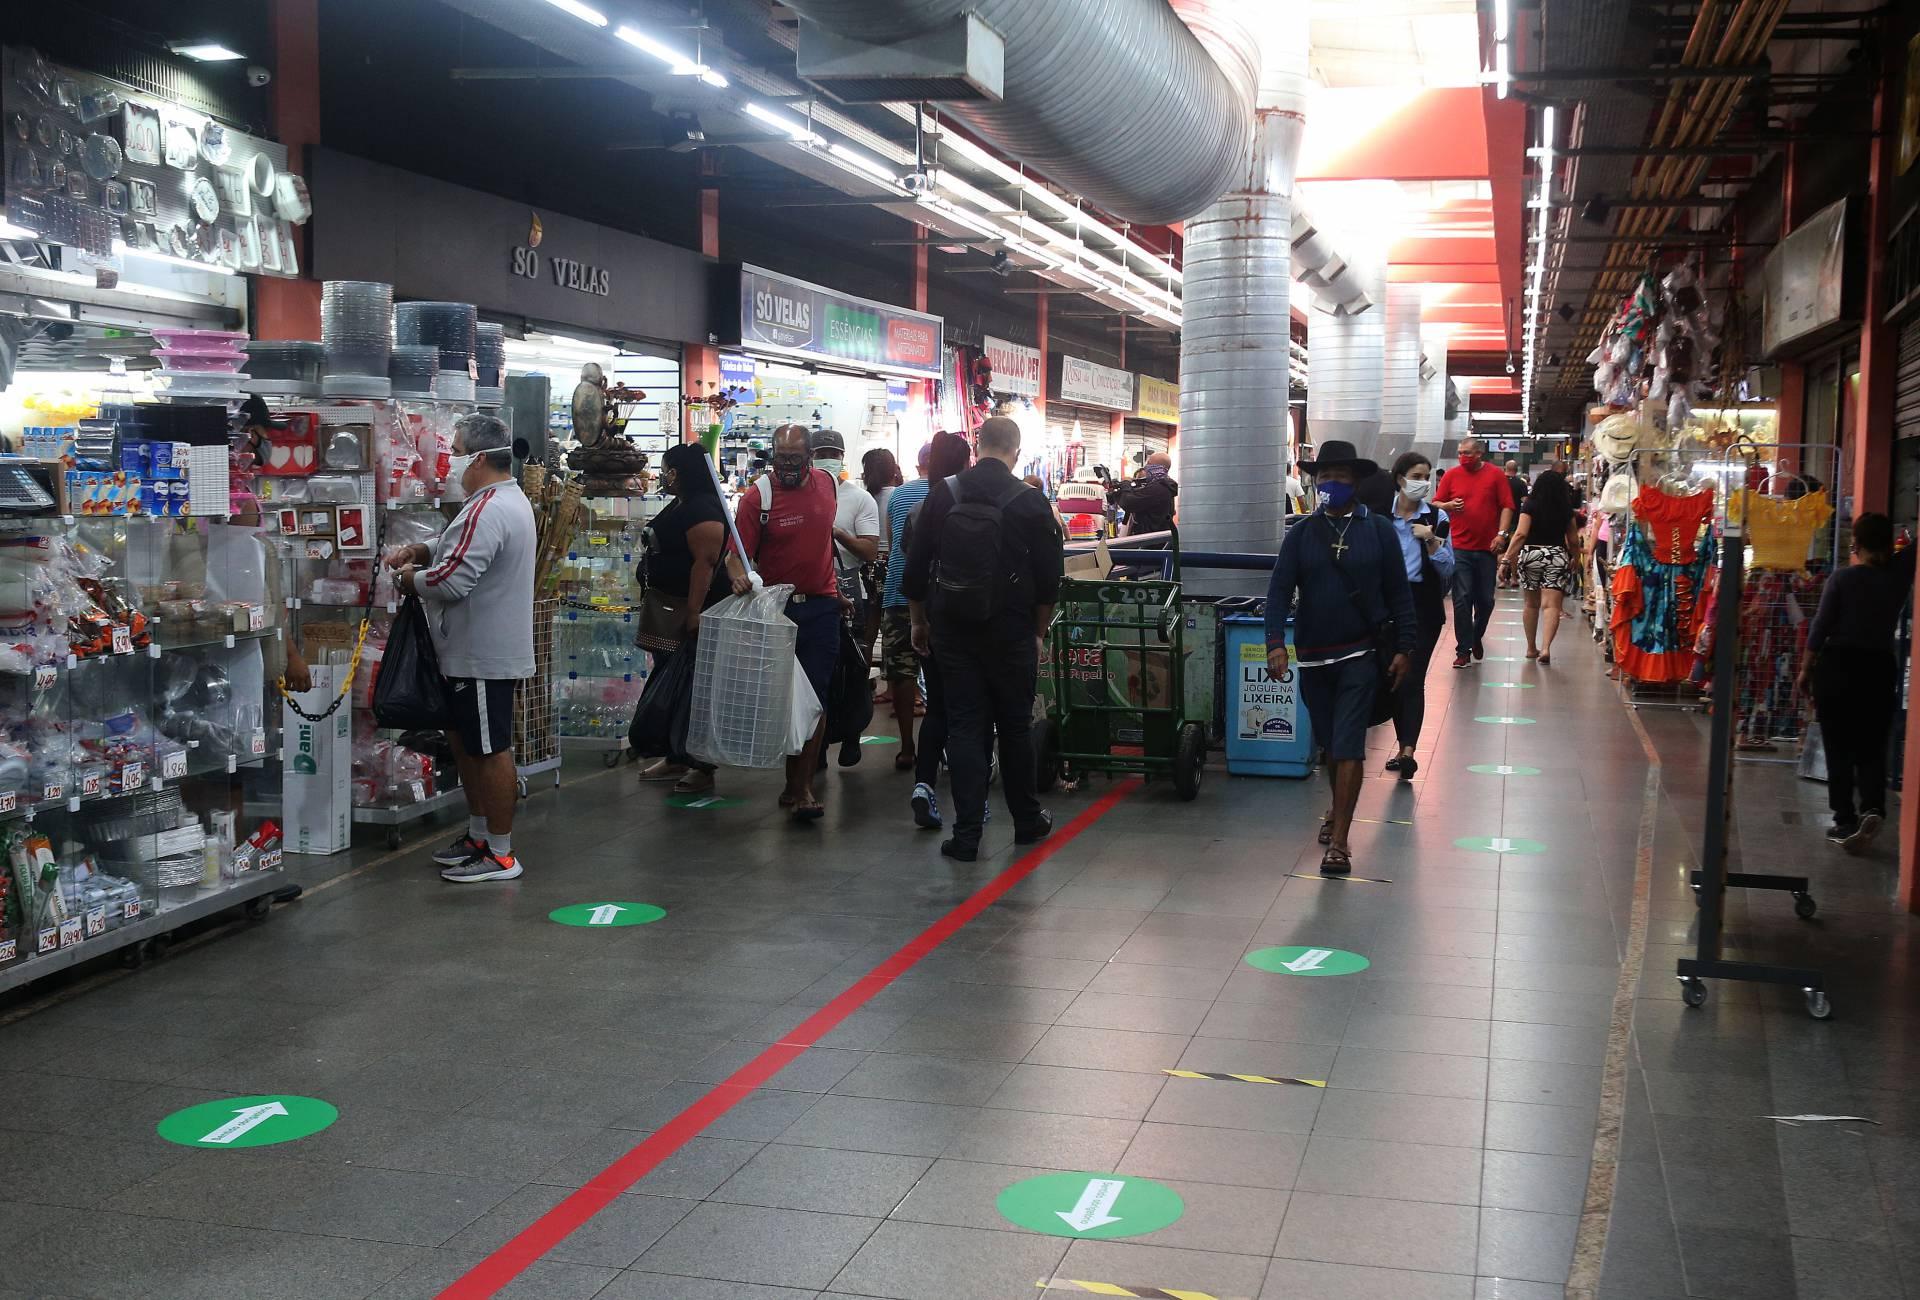 Clientes têm que usar máscara para circular pelos corredores e lojas